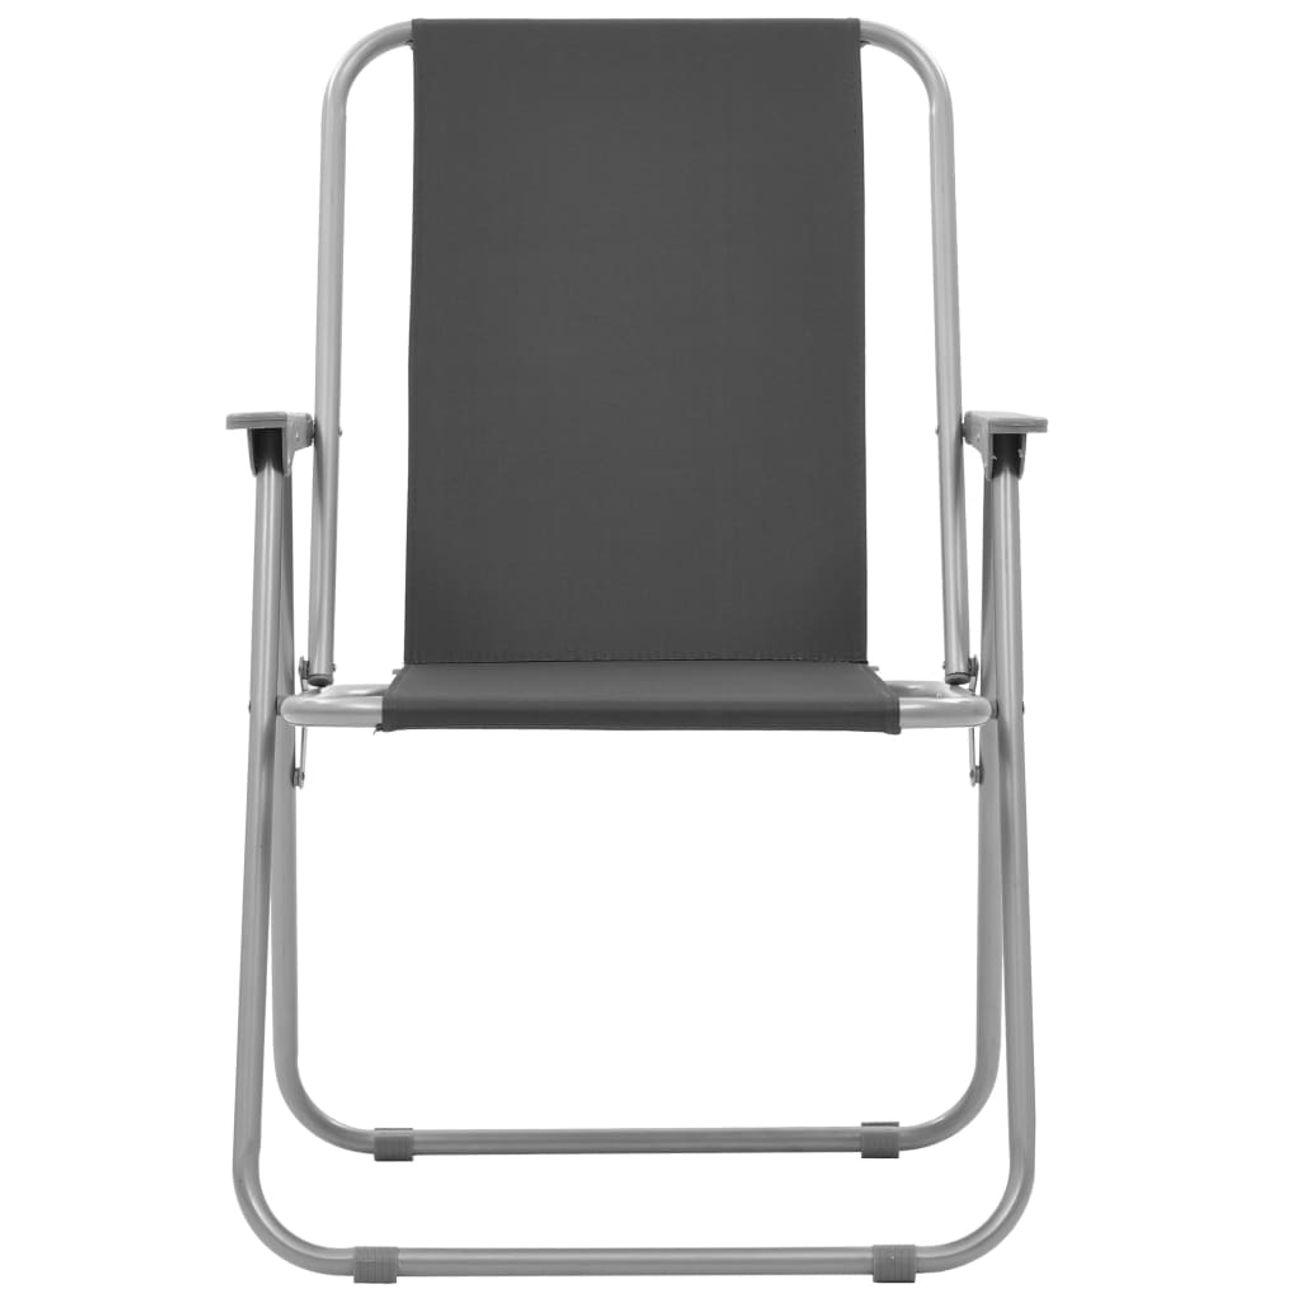 VIDAXL vidaXL Chaise pliante de camping 2 pcs 52 x 59 x 80 cm Gris